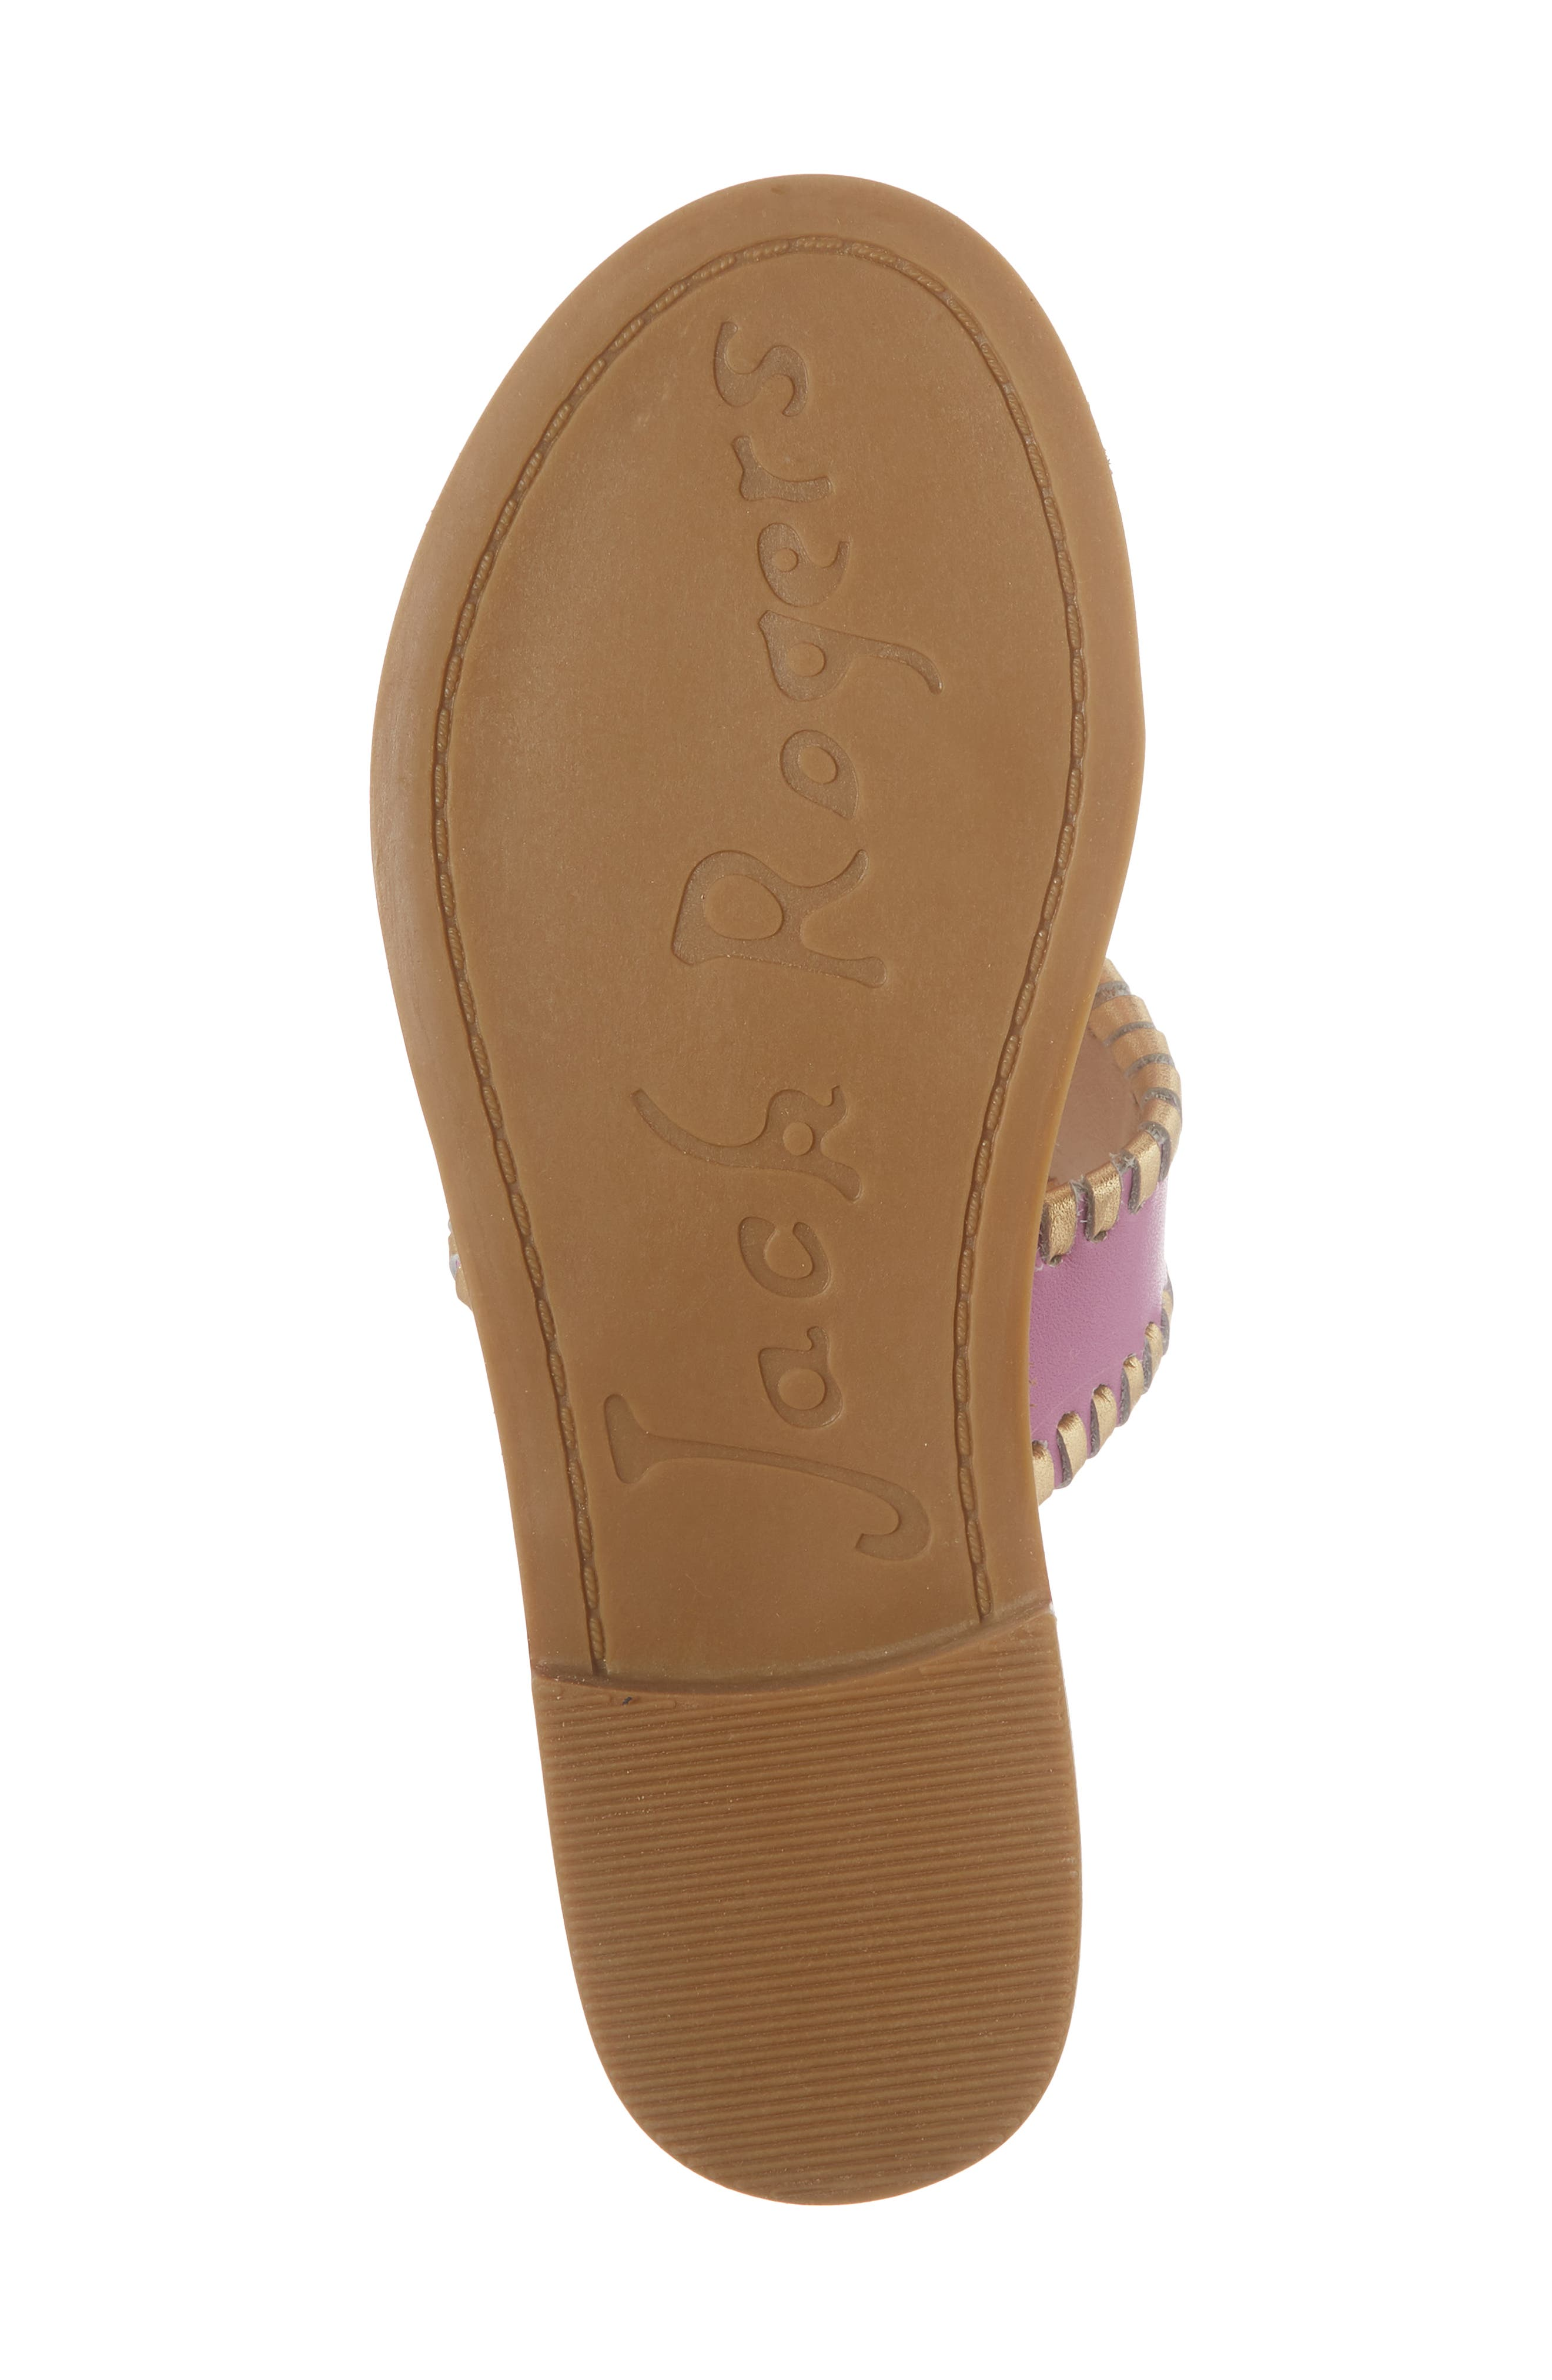 Miss Hollis Metallic Trim Thong Sandal,                             Alternate thumbnail 6, color,                             Lavender Pink/ Gold Leather